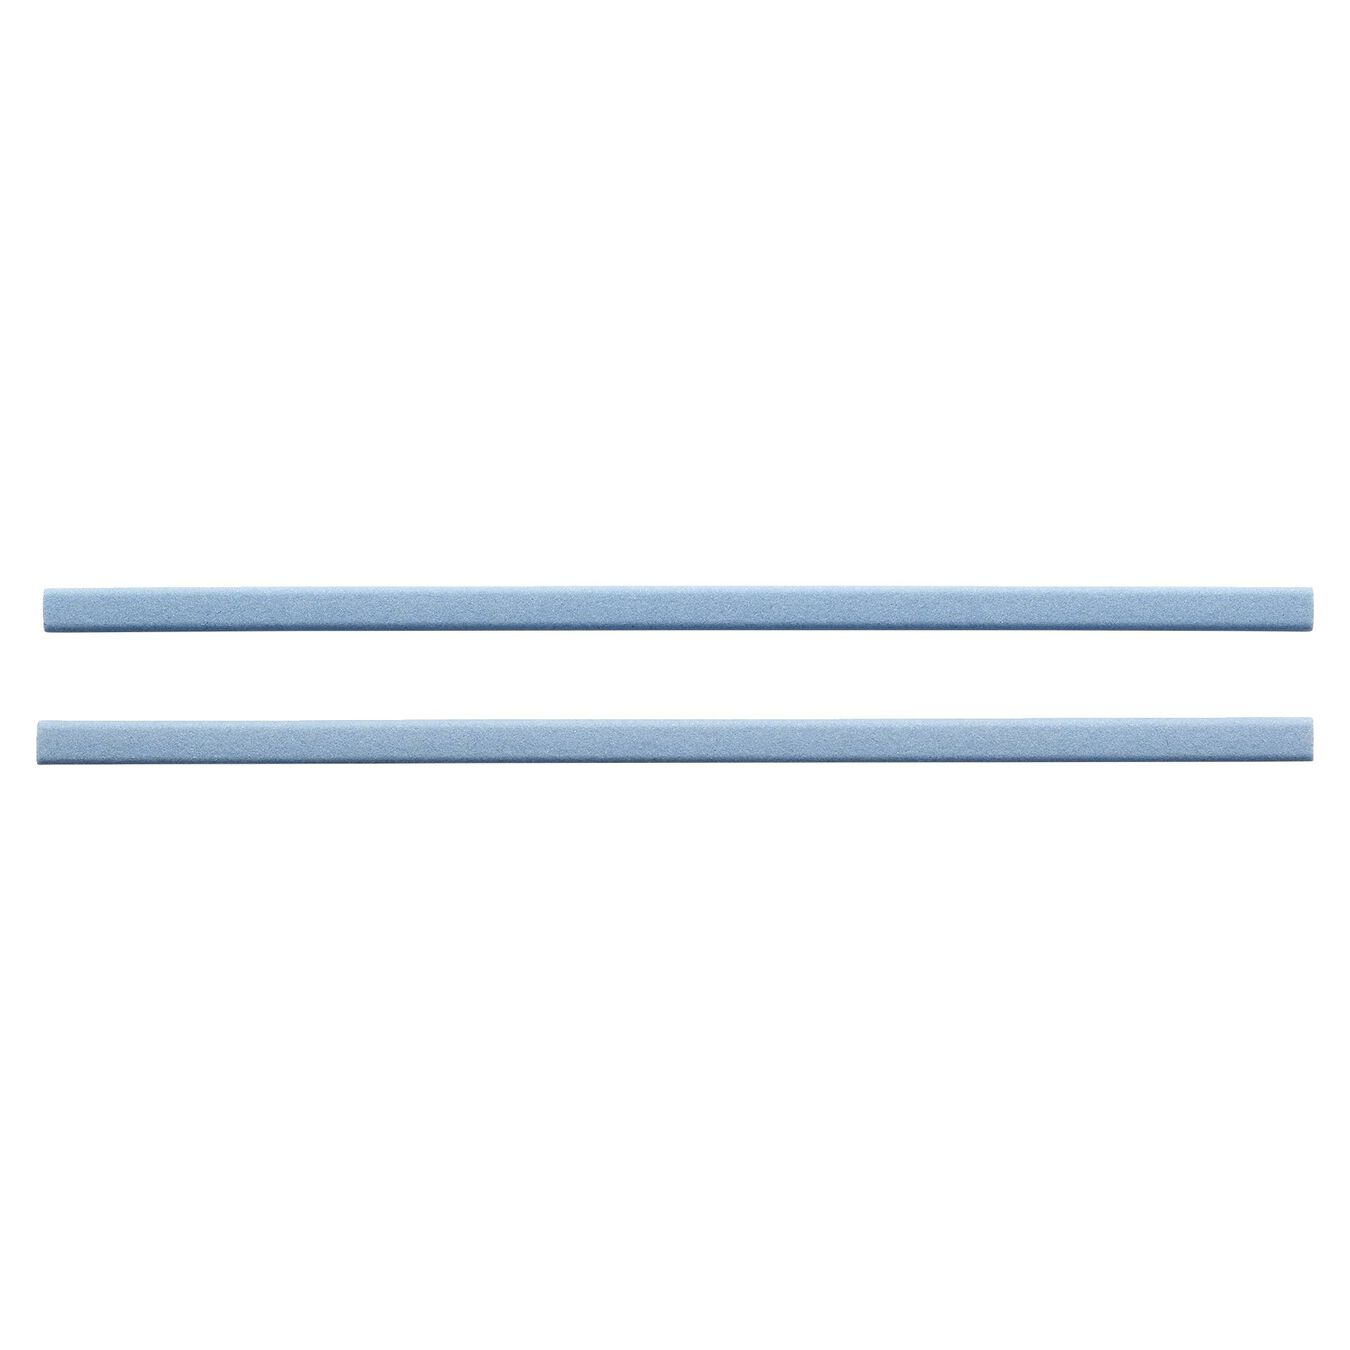 Sharpening rod, 2 cm | blue | Ceramic,,large 1